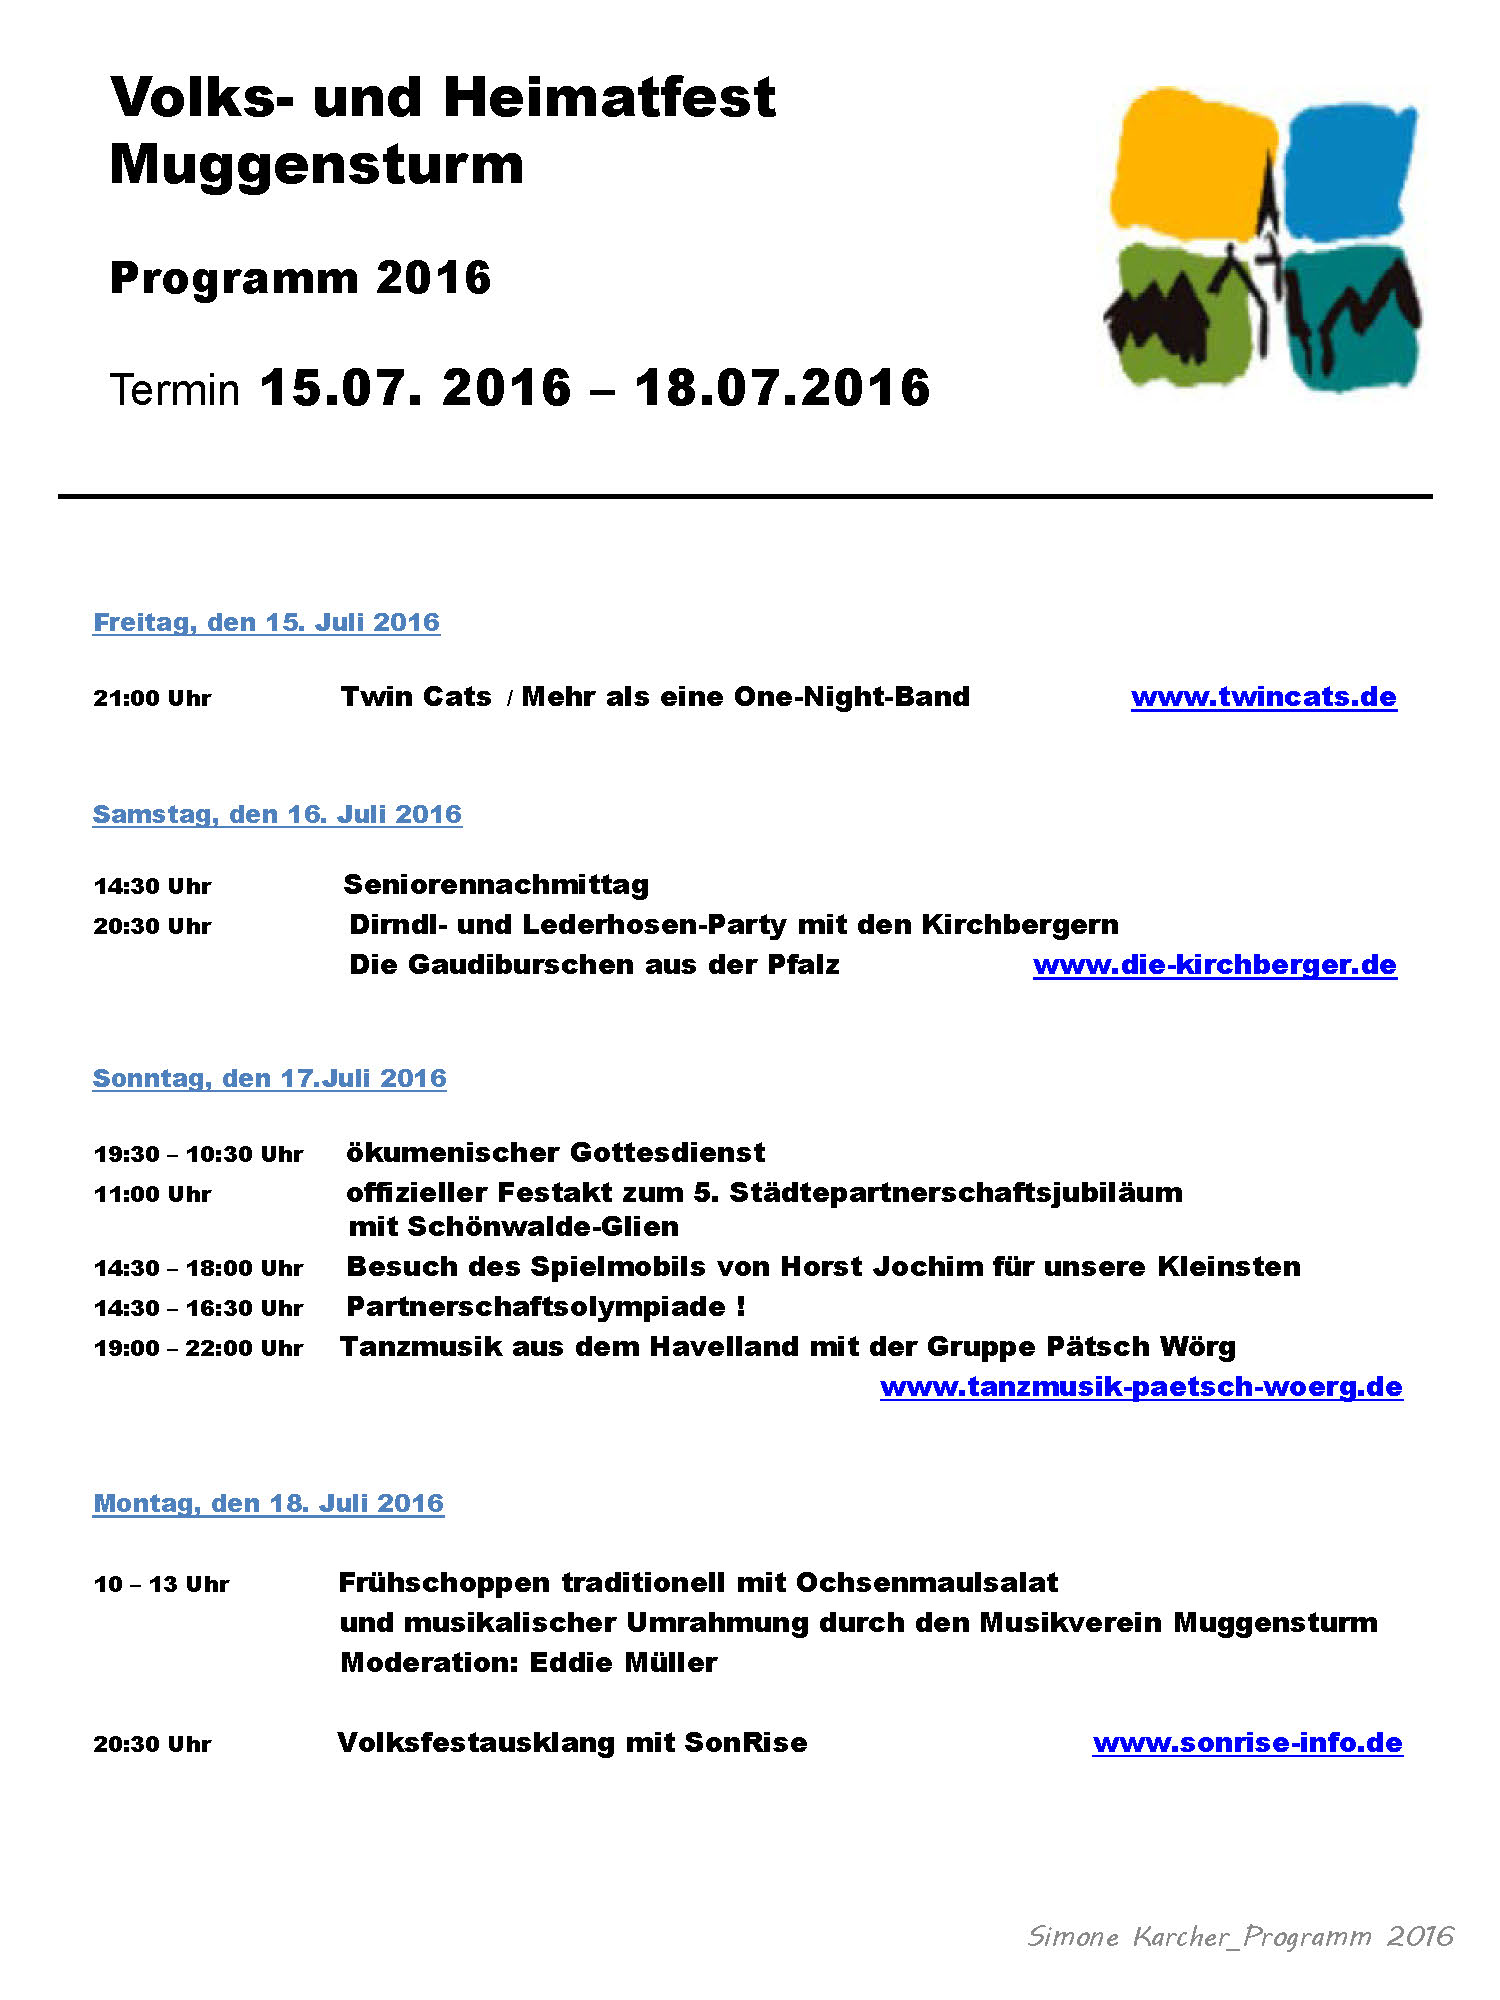 Programm_2016